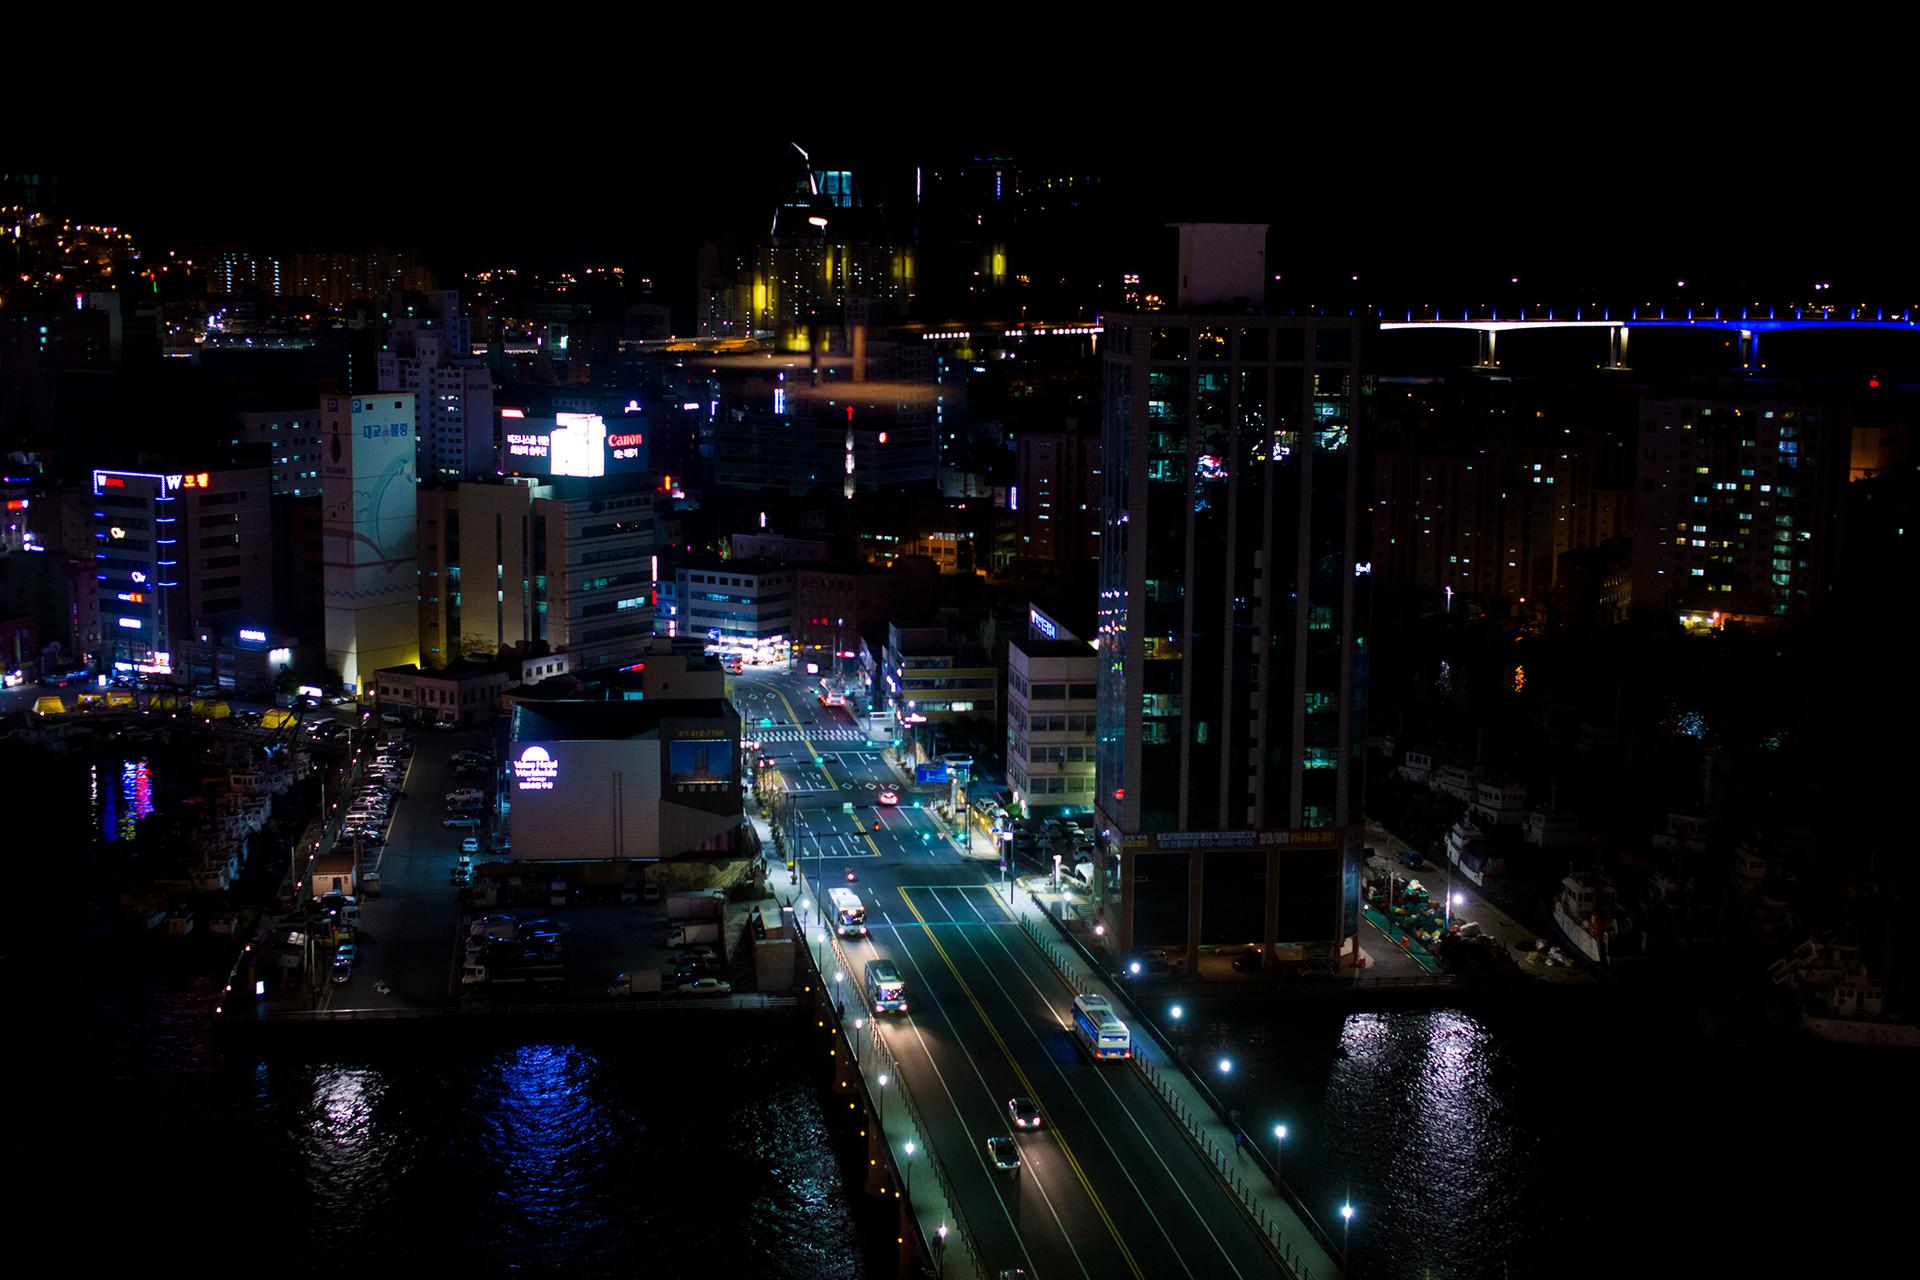 Nightscape City Bridge Night Korea Travel Trip Malaysia Kuala Lumpur Melaka Johor Photography Top Best  Photographer 韓國 旅行 釜山